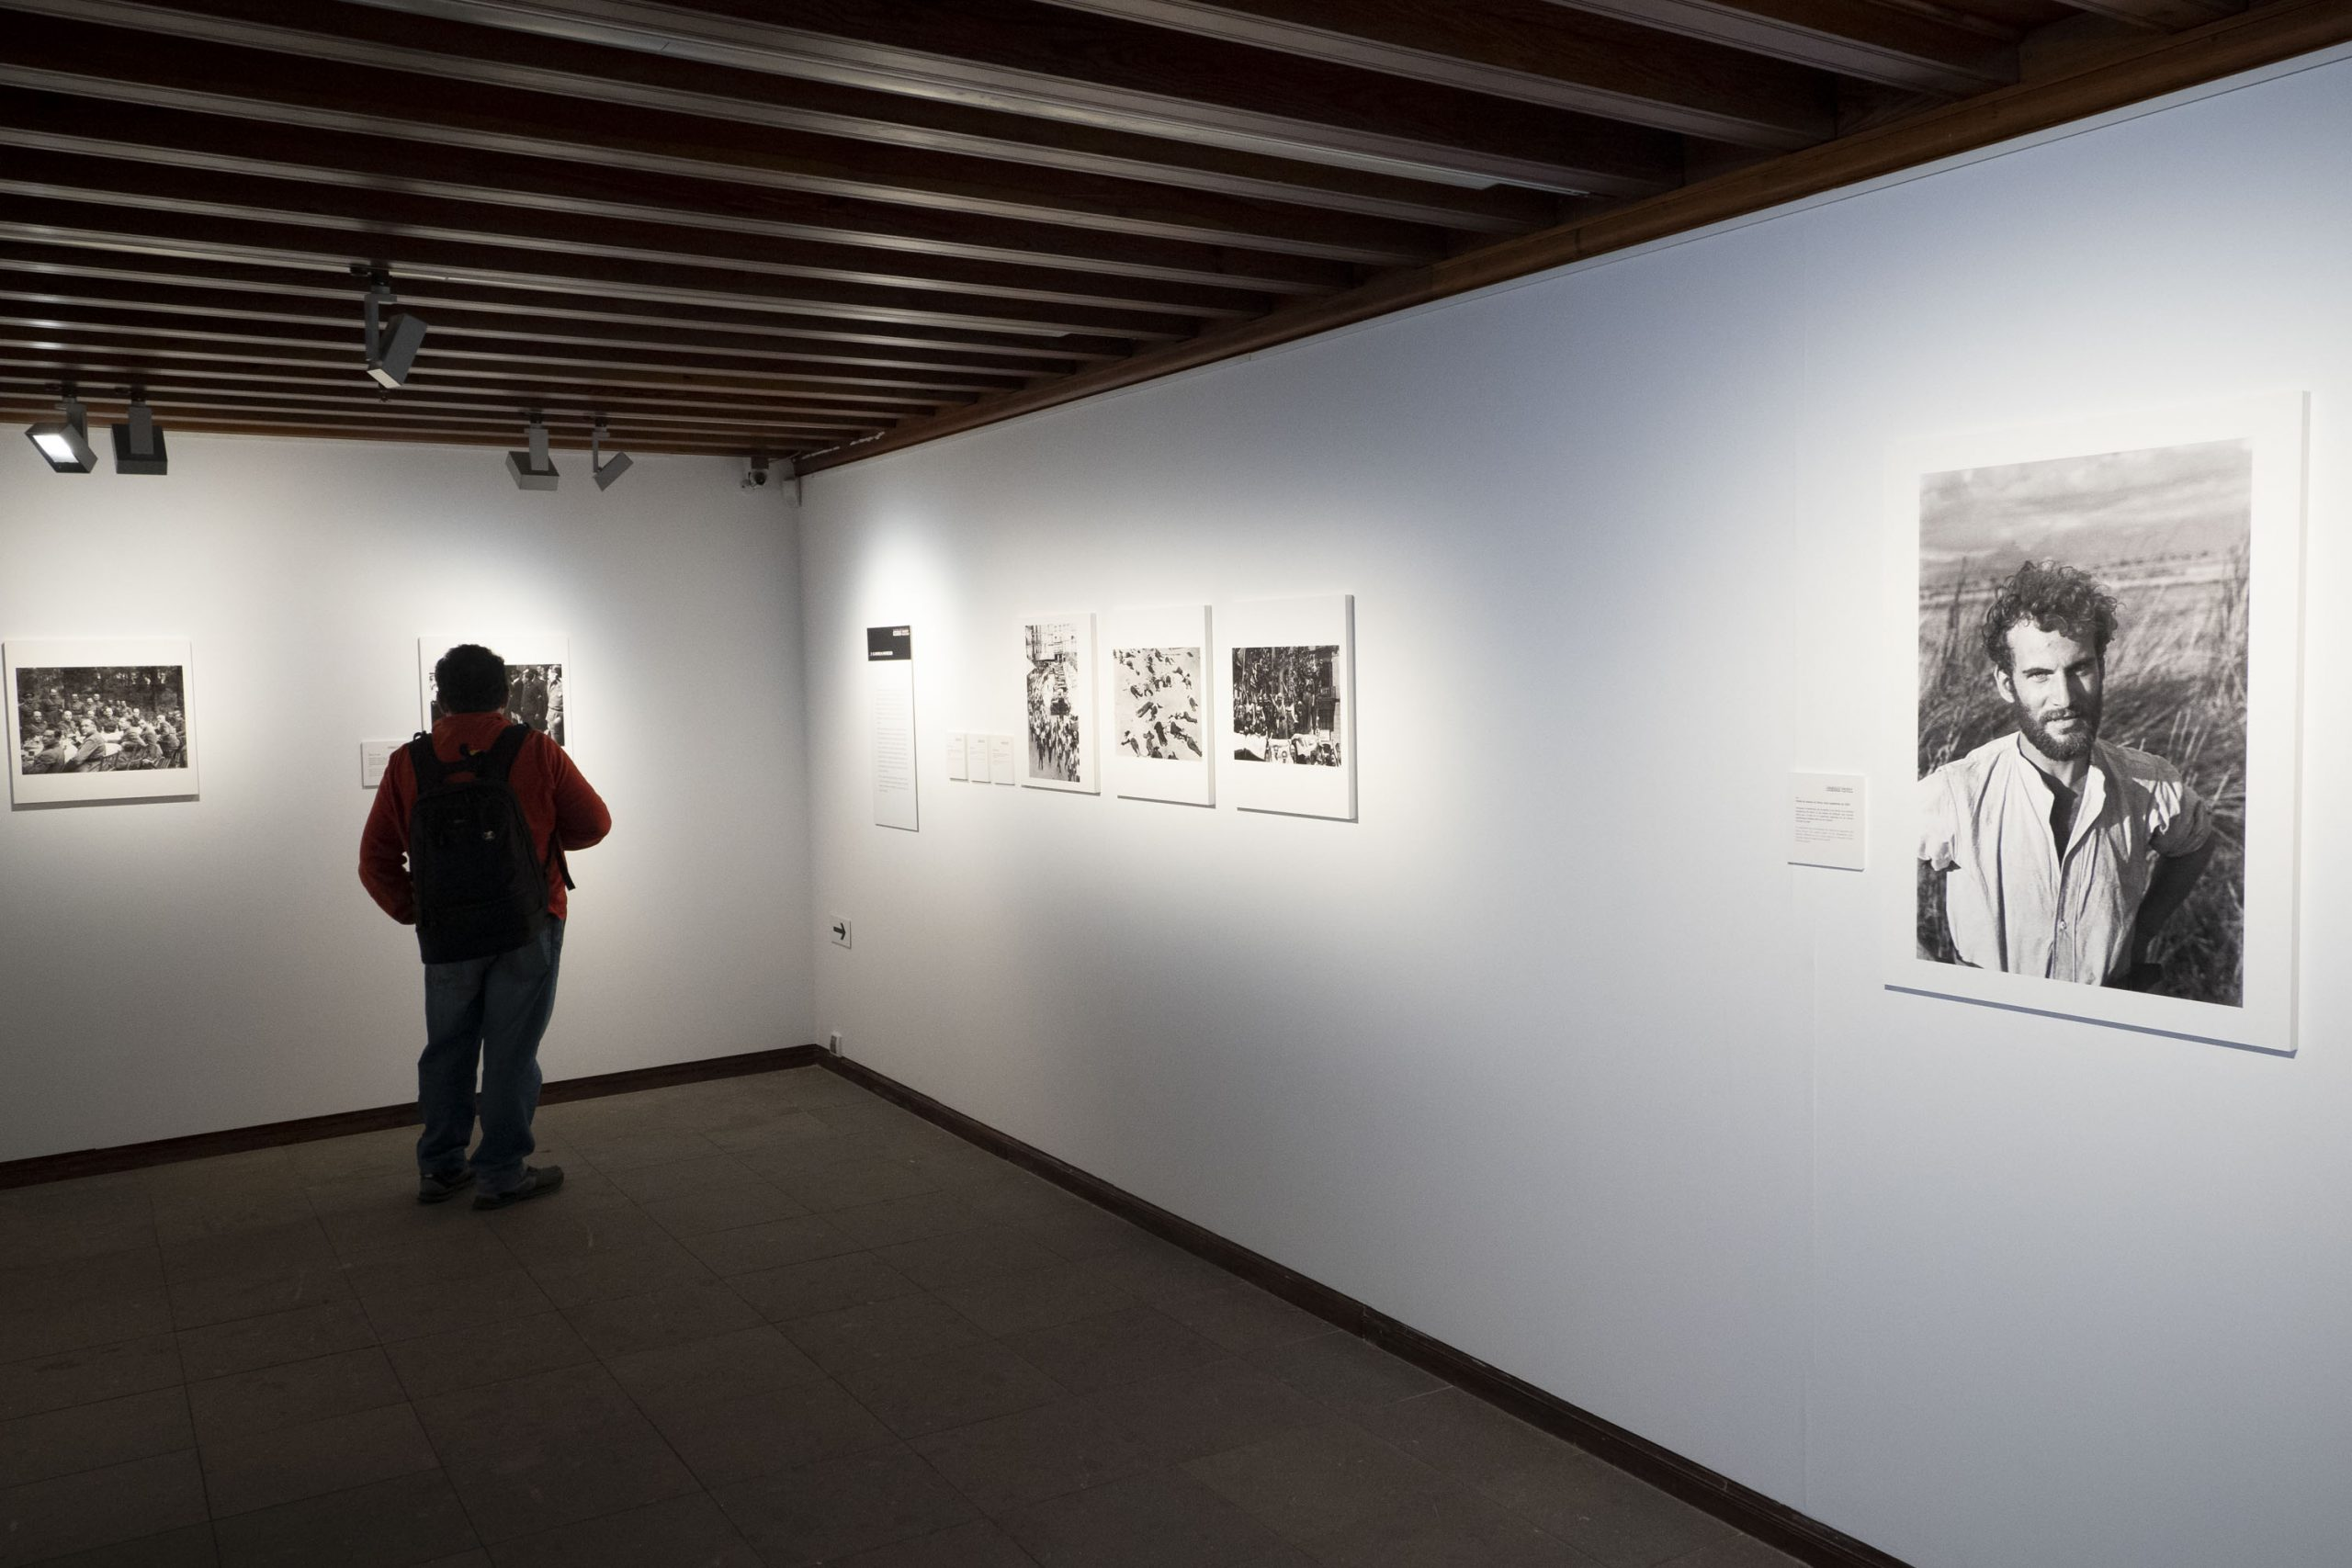 cb Exposicion Imagenes Ineditas de La Guerra Civil15 scaled